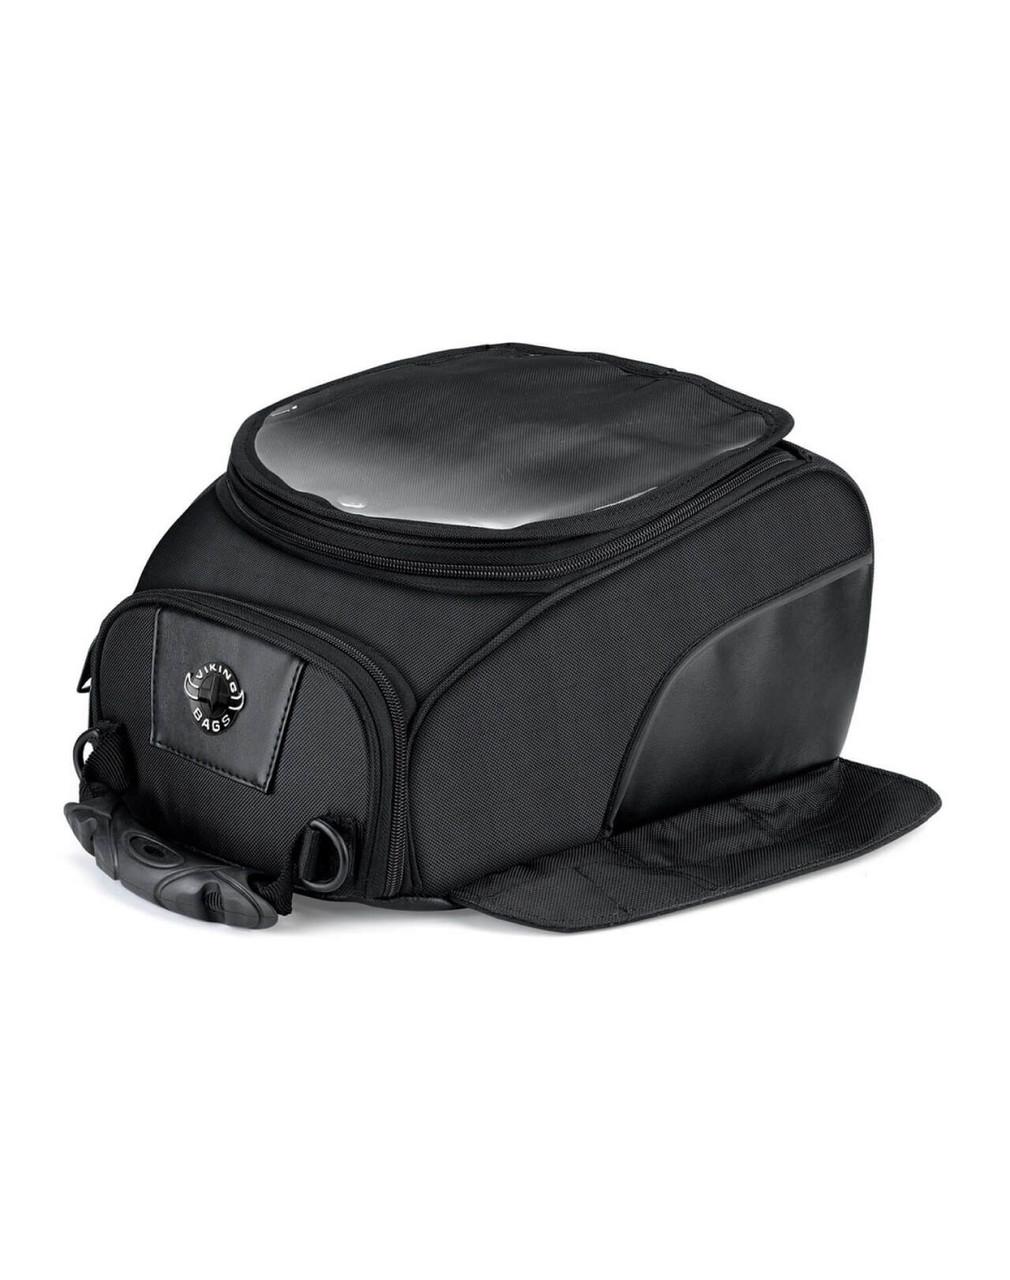 VikingBags 14 Large Kawasaki Magnetic Motorcycle Tank Bag Main Bag View